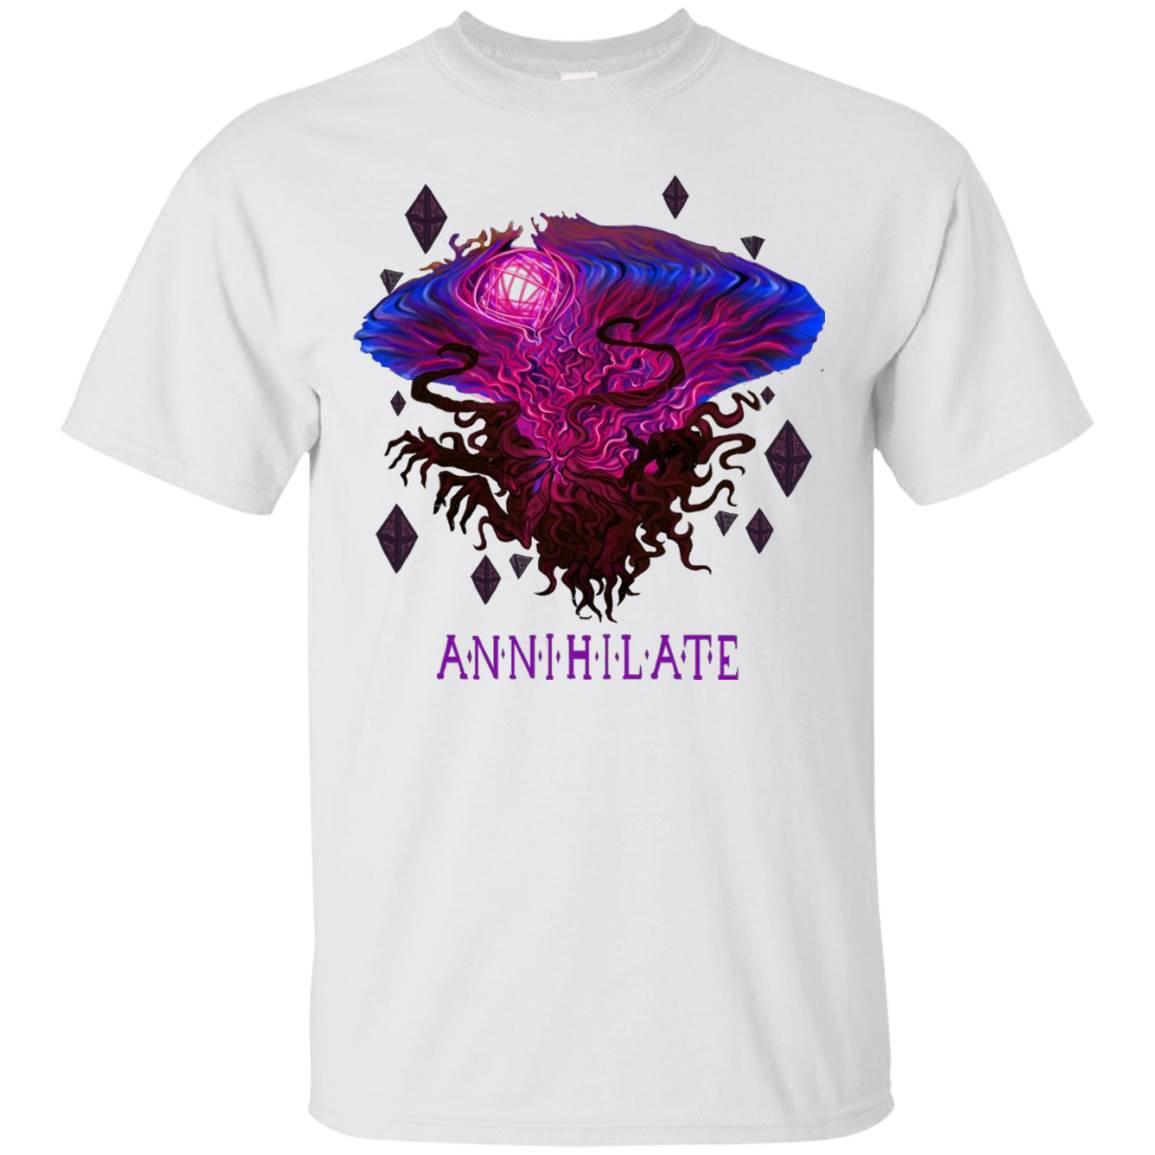 Emrakul Art Shirt